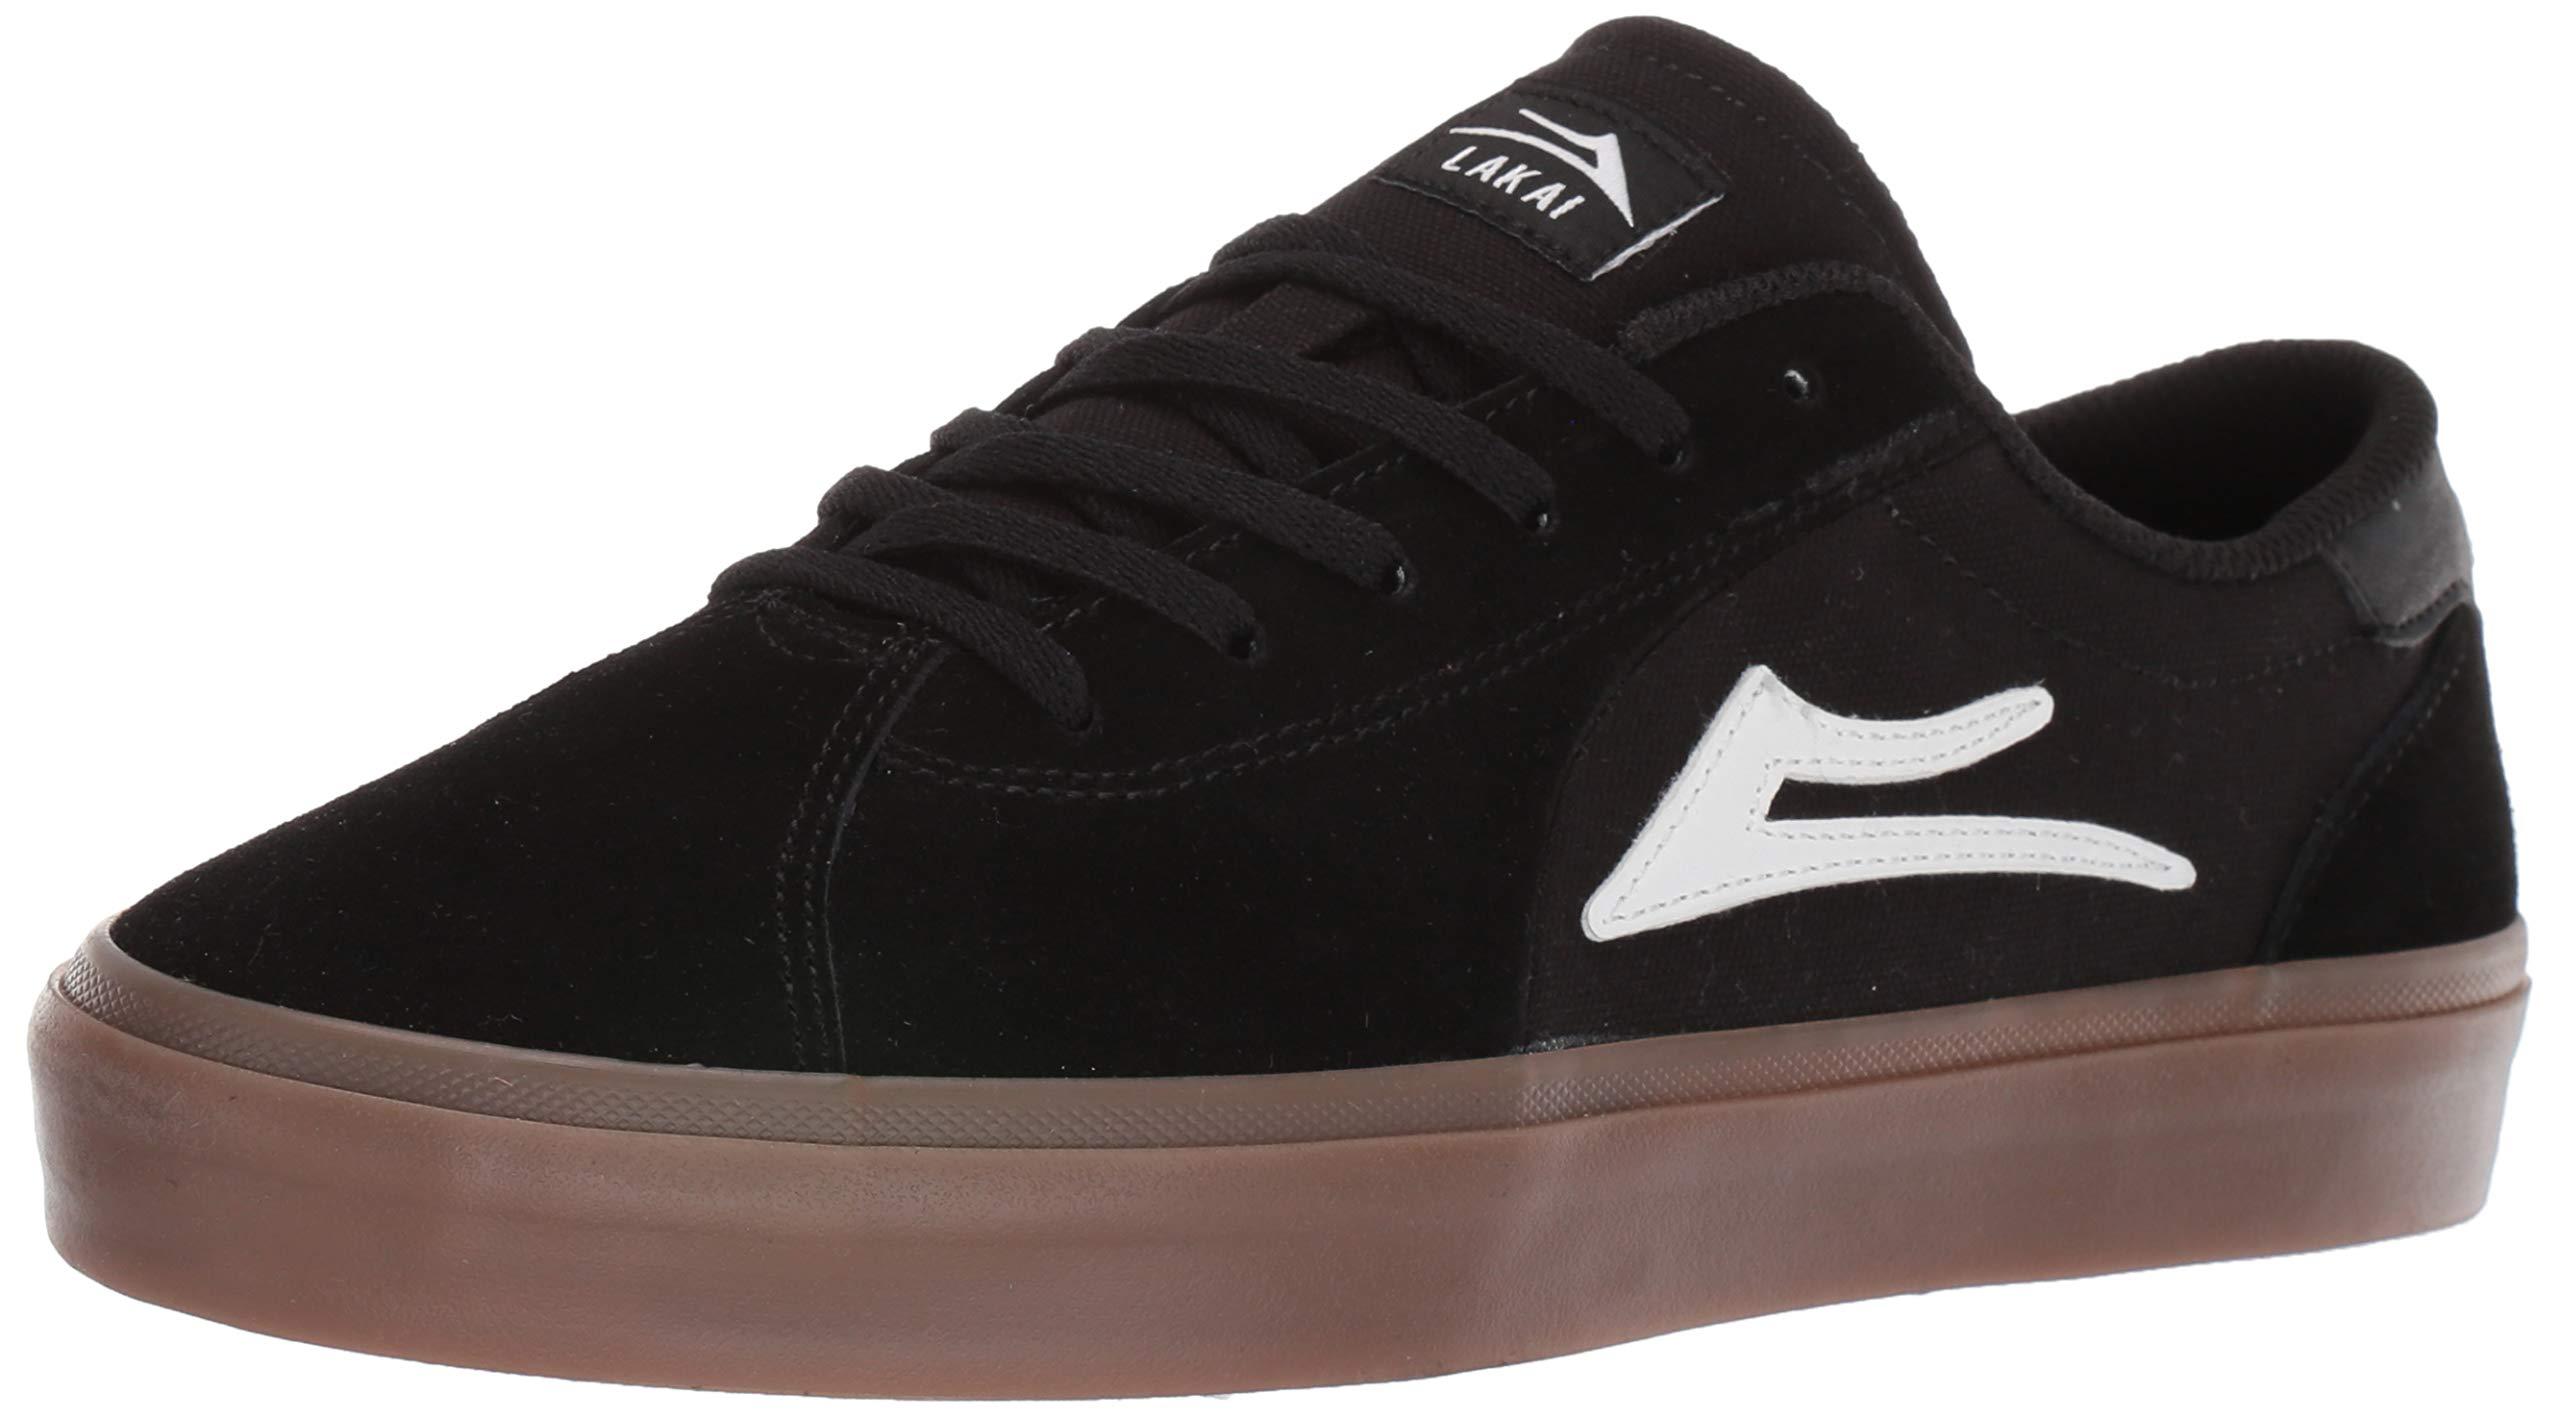 Lakai Footwear Summer 2019 Flaco II Black/Gum Suede Size 8.5 Tennis Shoe, M US by Lakai